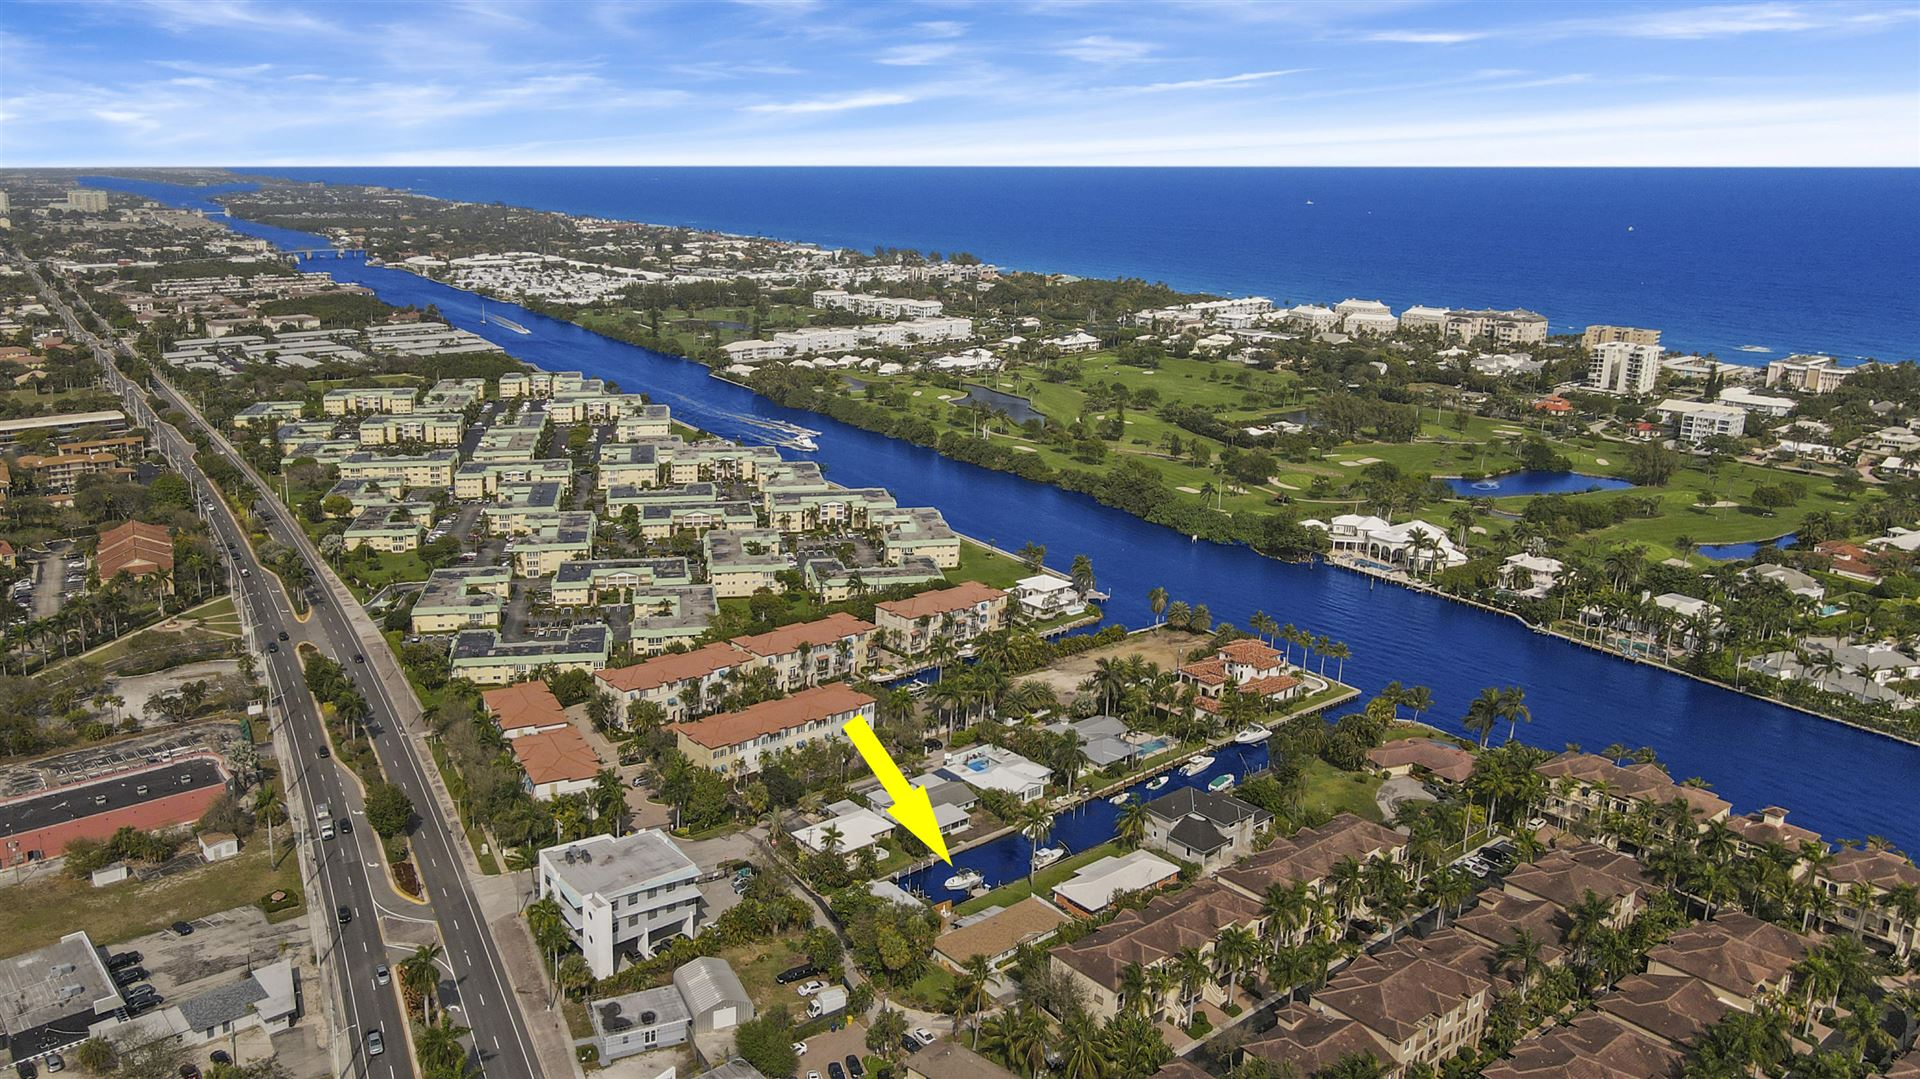 Photo of 807 Palmer Road, Delray Beach, FL 33483 (MLS # RX-10695052)